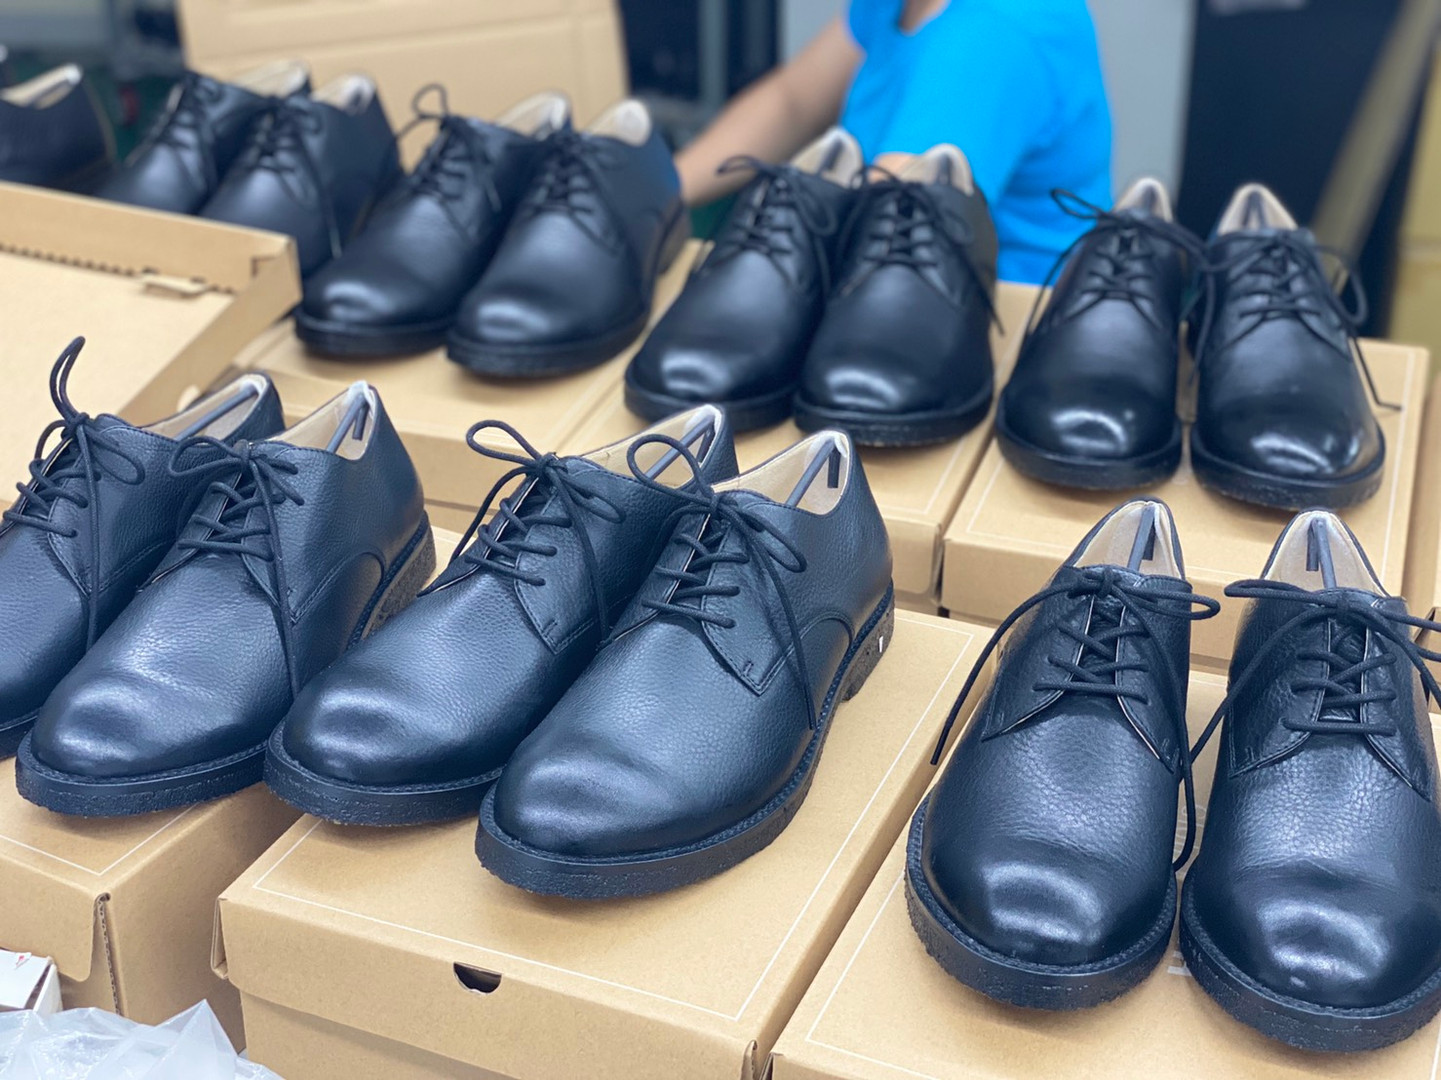 leather-14.jpg